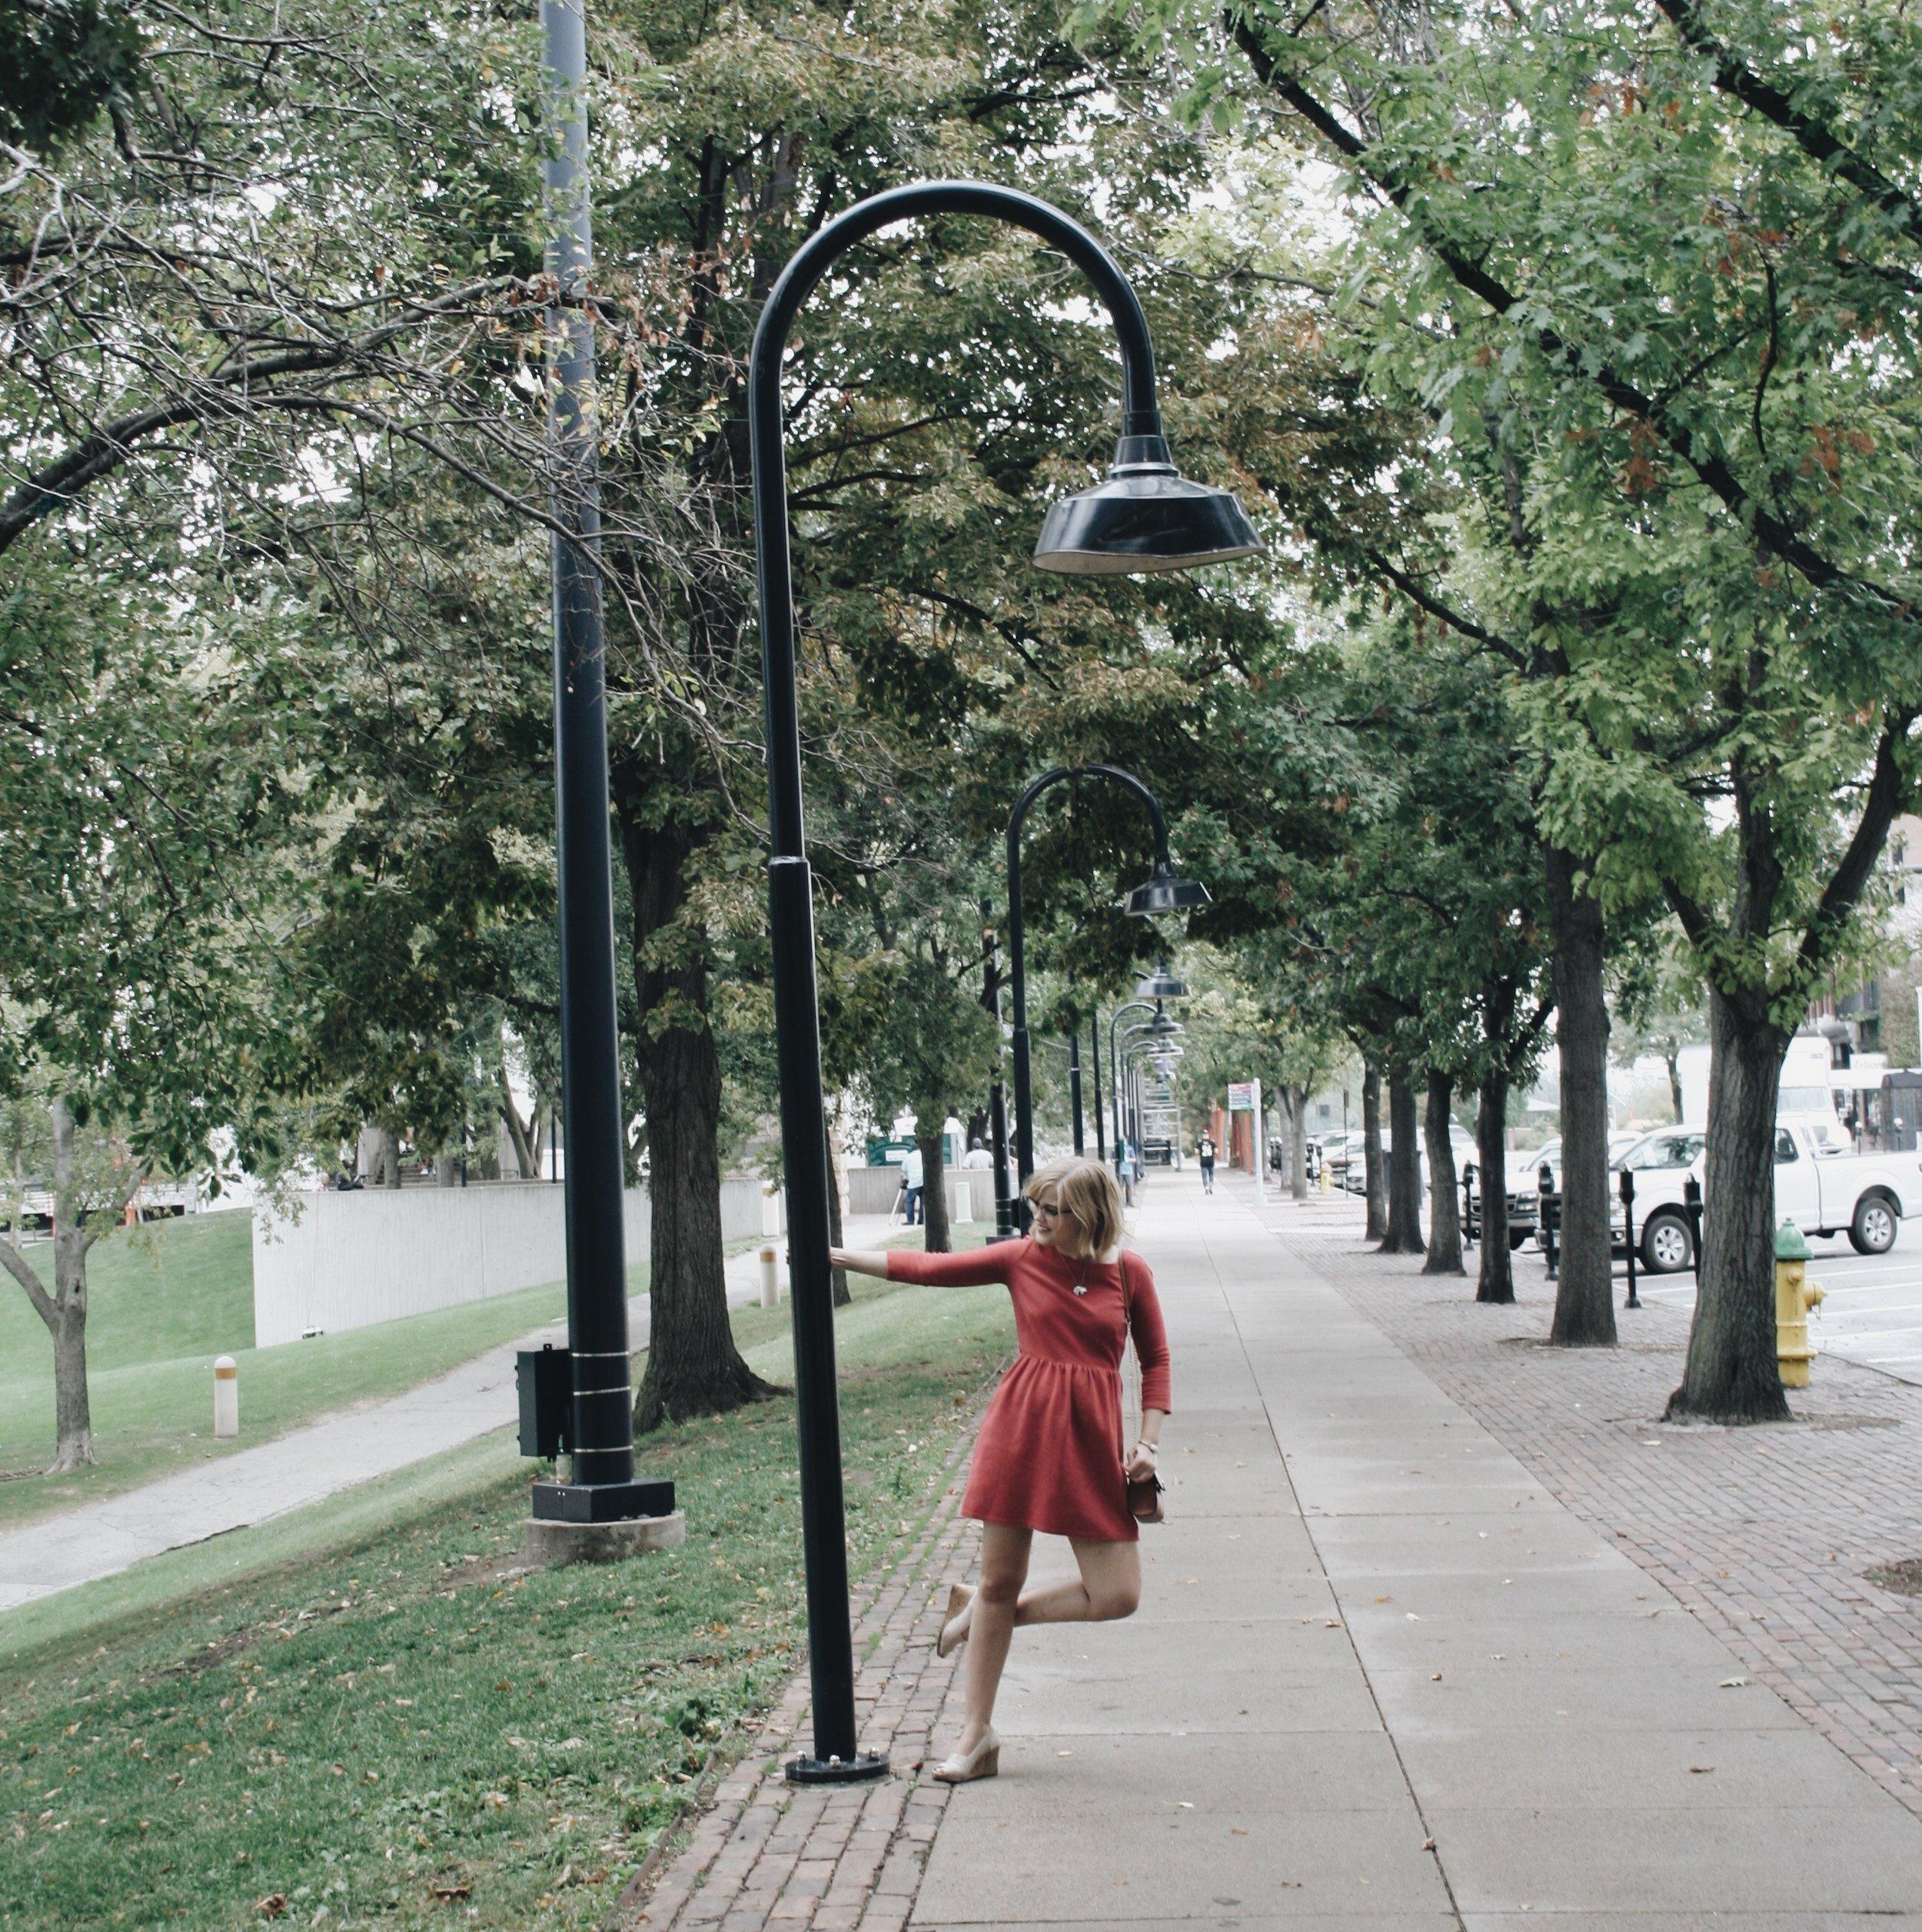 See lightpost, try to replicate Gene Kelly in Singin' in the Rain